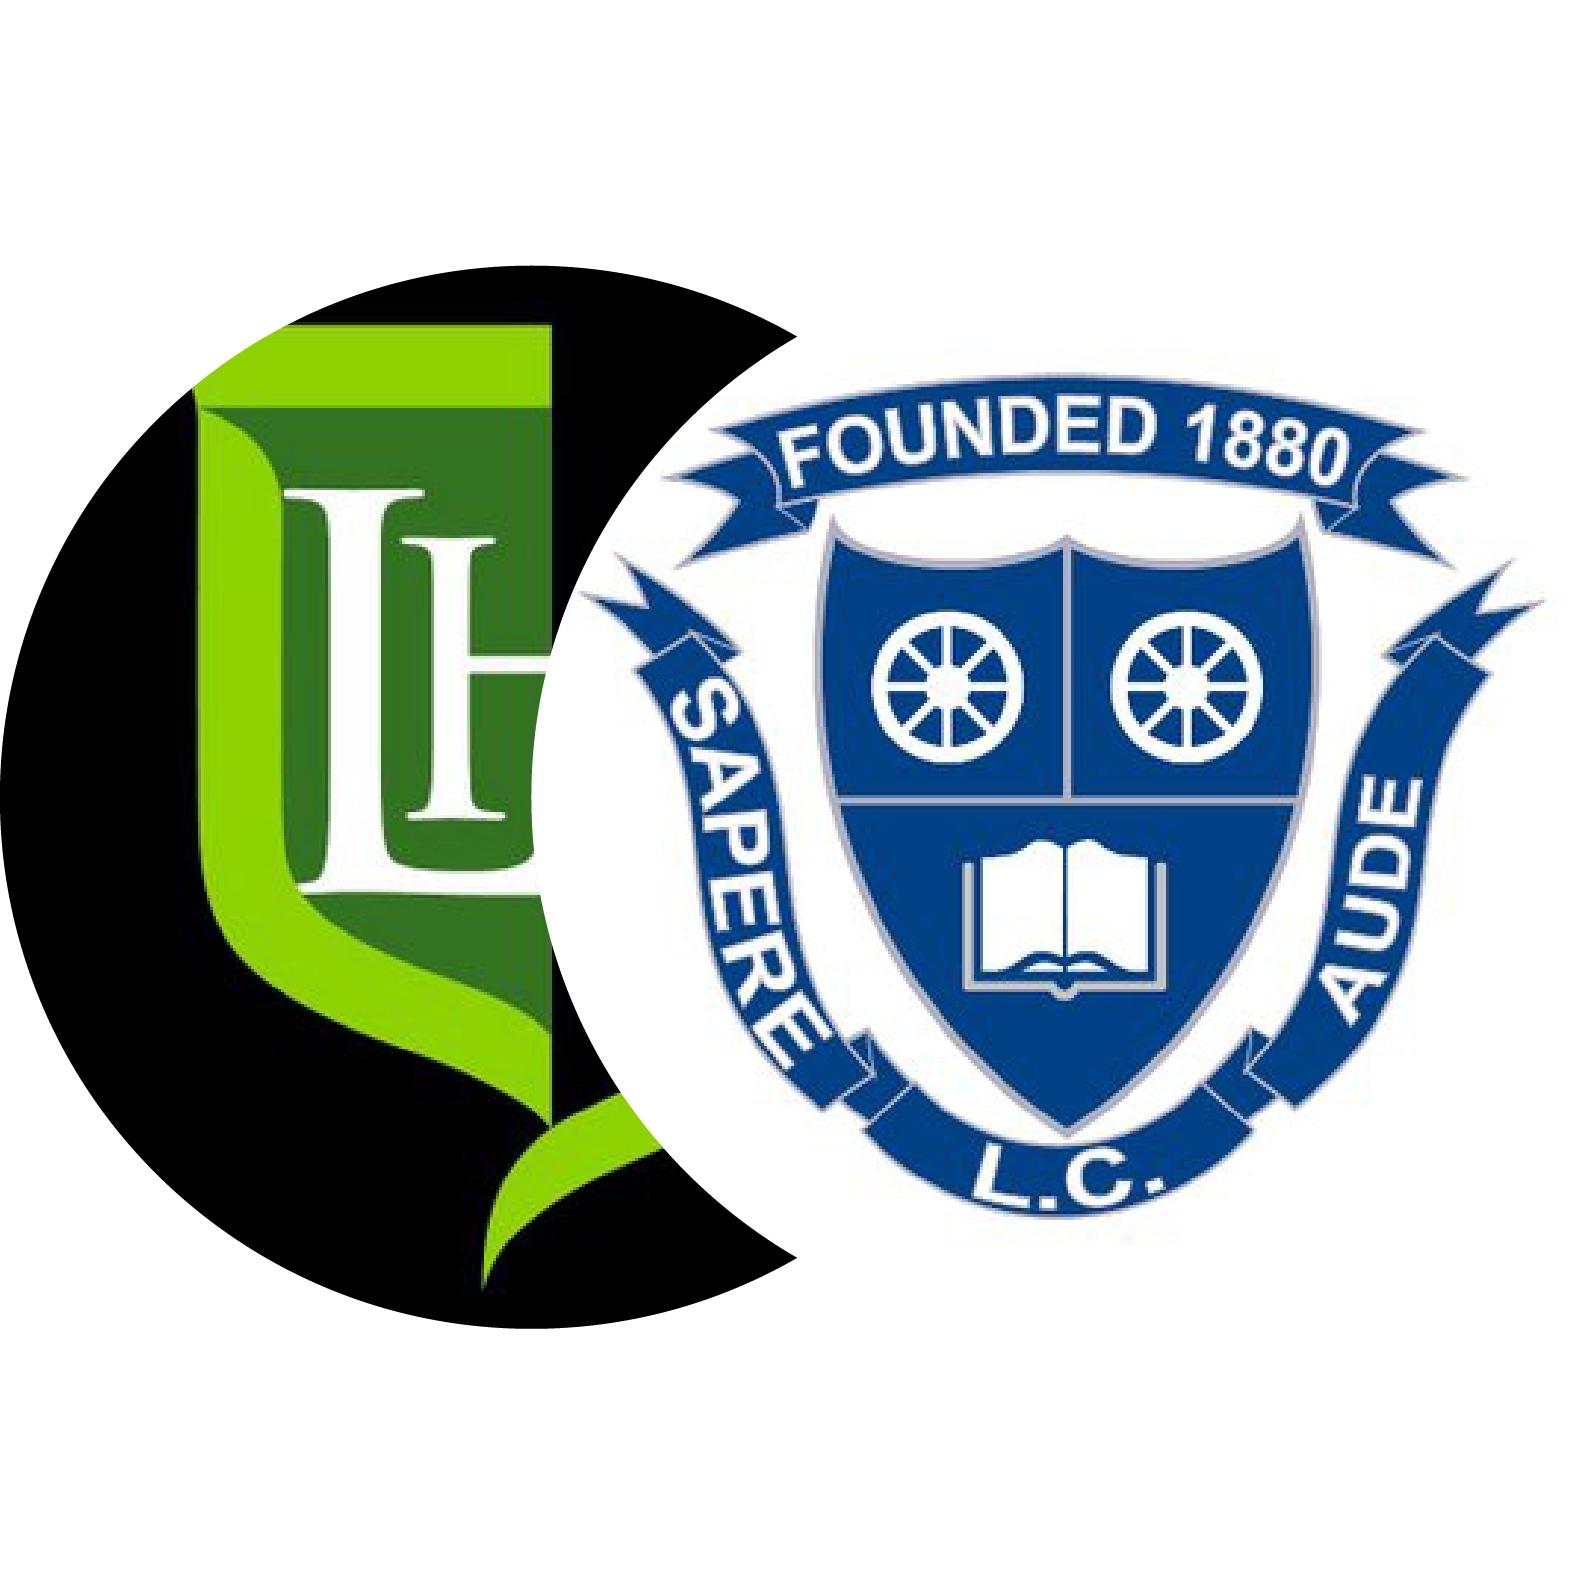 Lutterworth High School and Lutterworth College